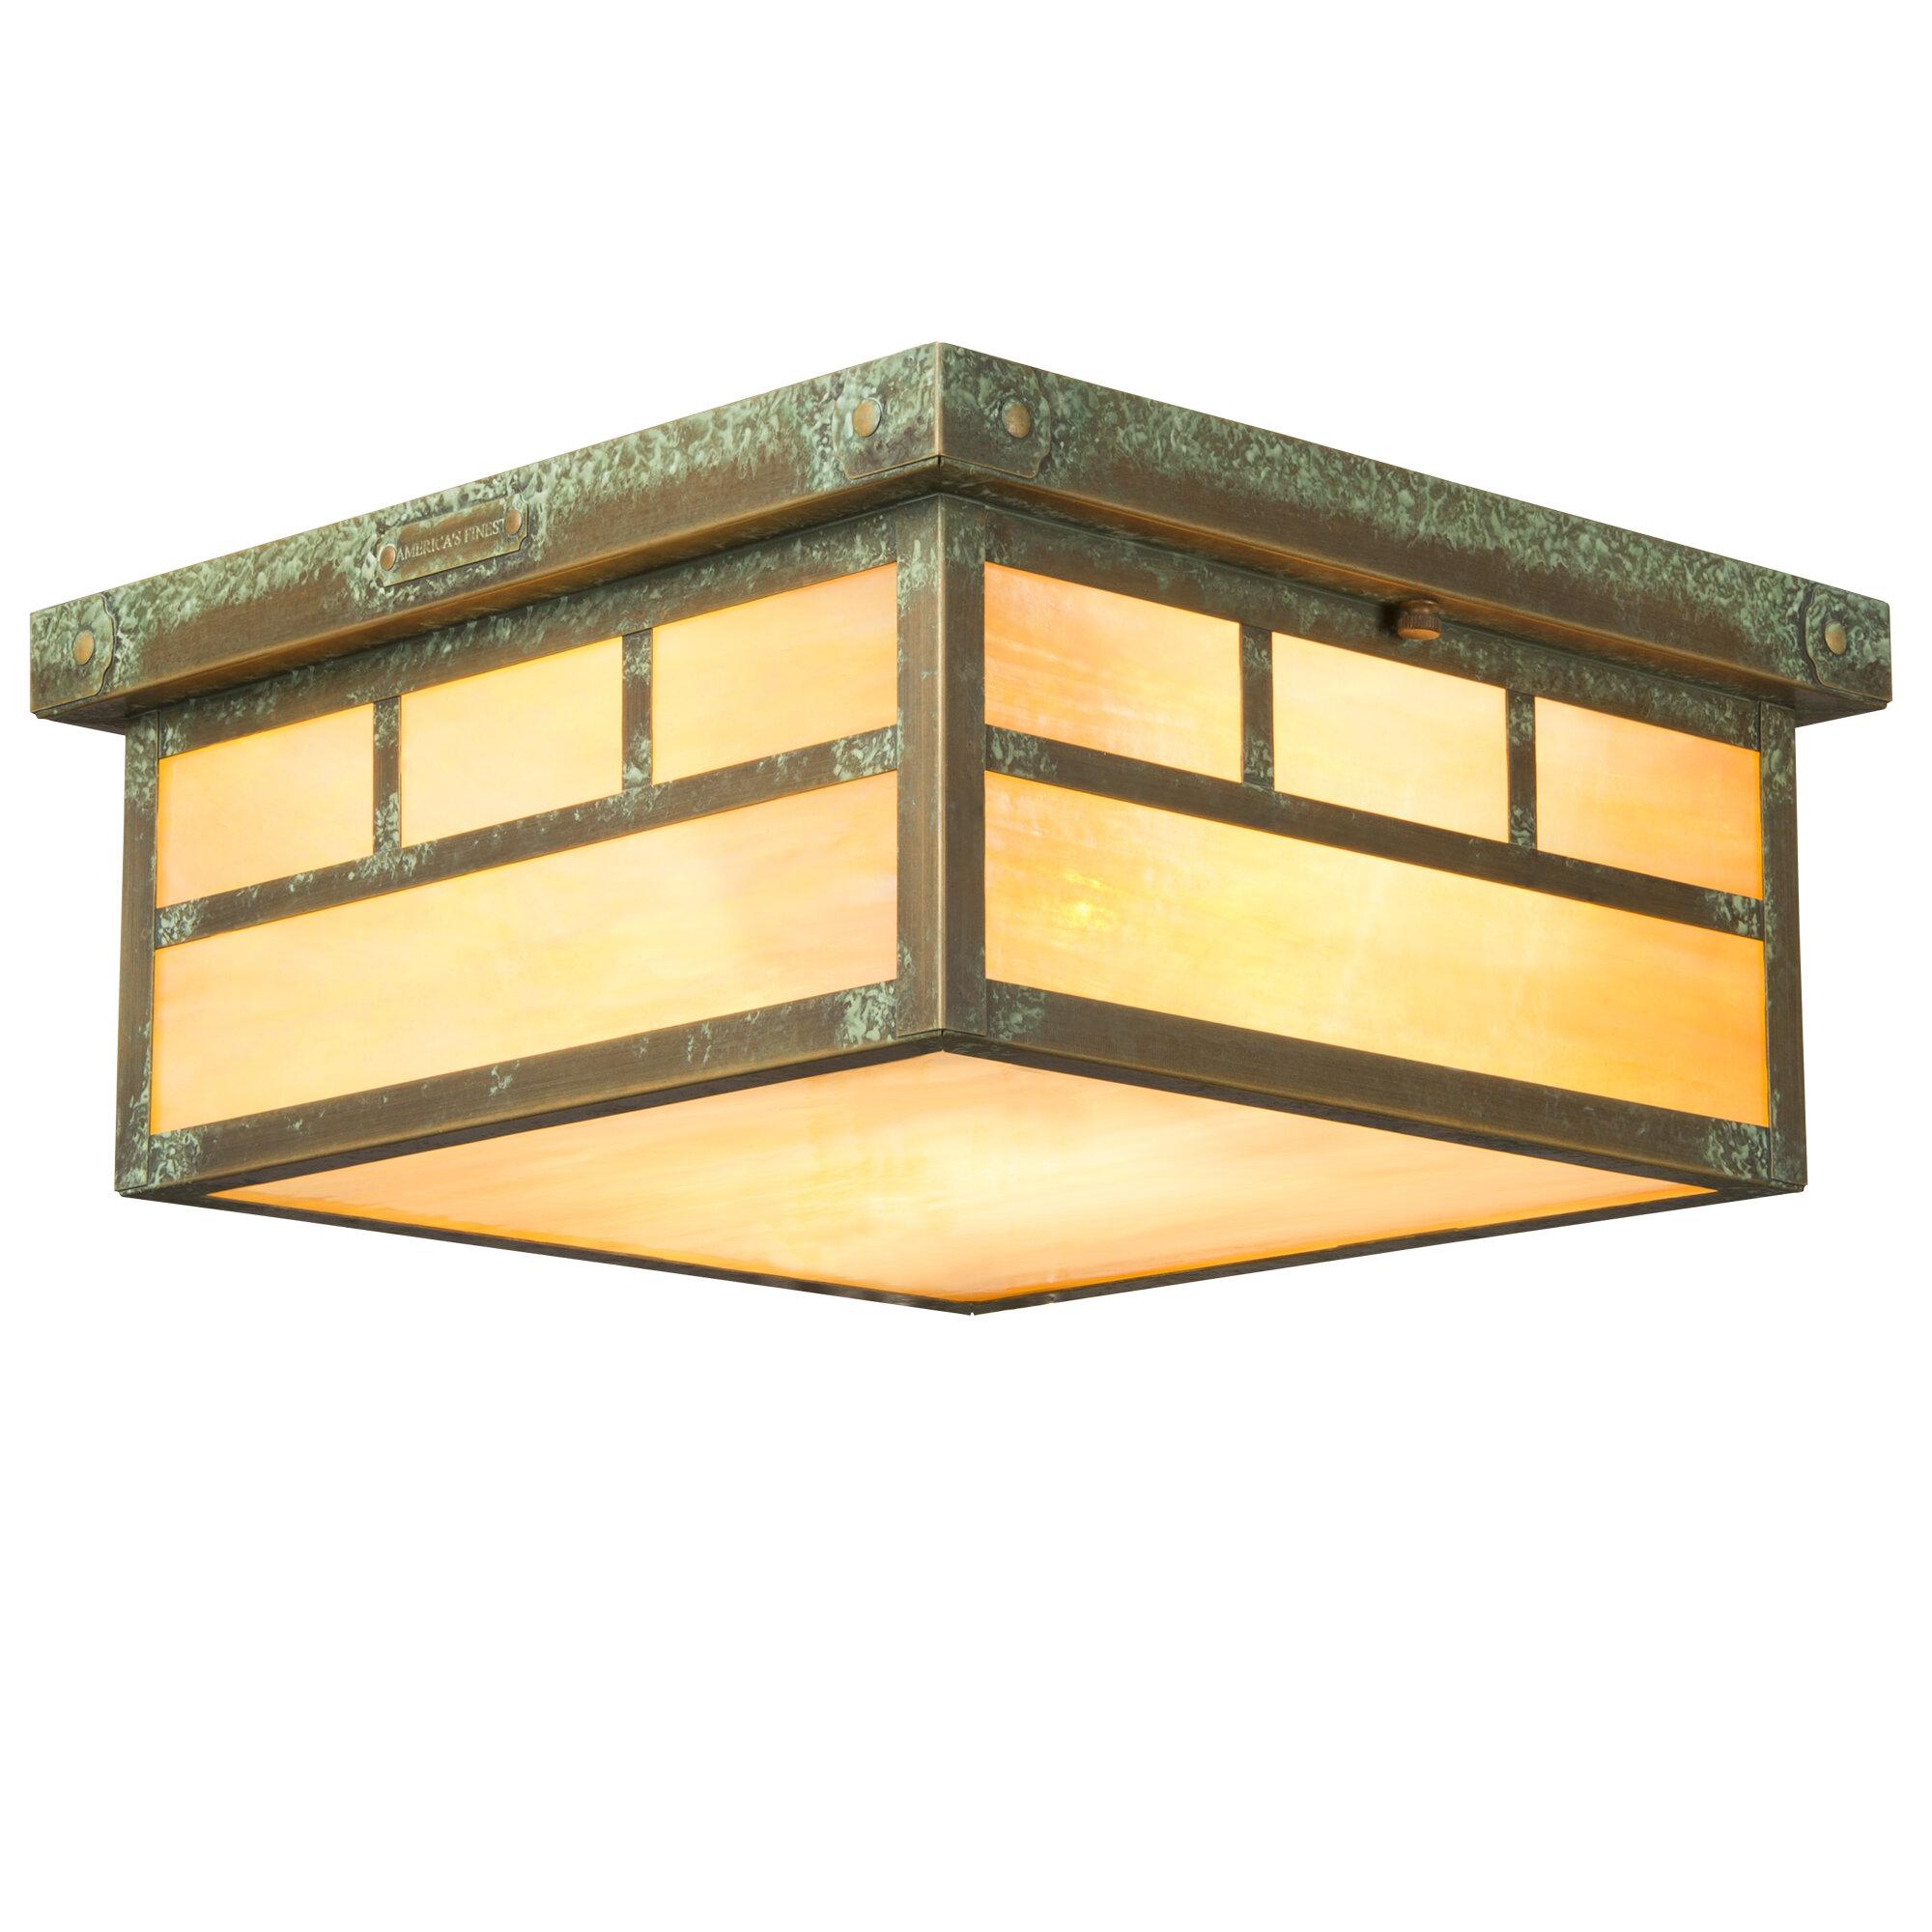 Millwood Pines Emond 1 Light 7 75 Lantern Square Flush Mount Wayfair